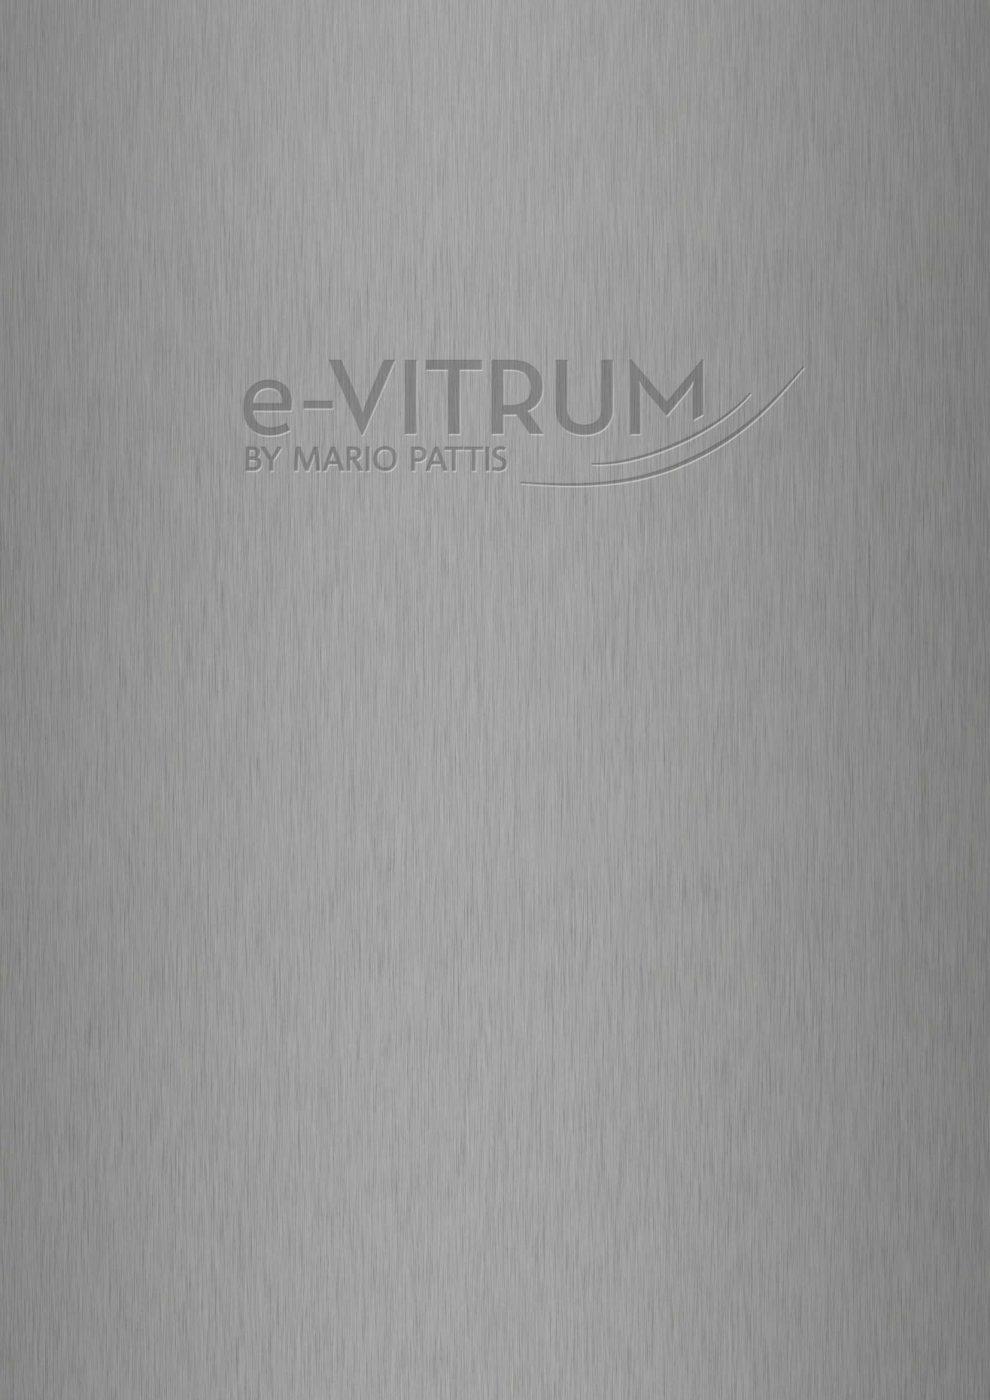 https://www.vitrum-dresden.de/wp-content/uploads/2018/08/0_Deckseite_web-990x1400.jpg